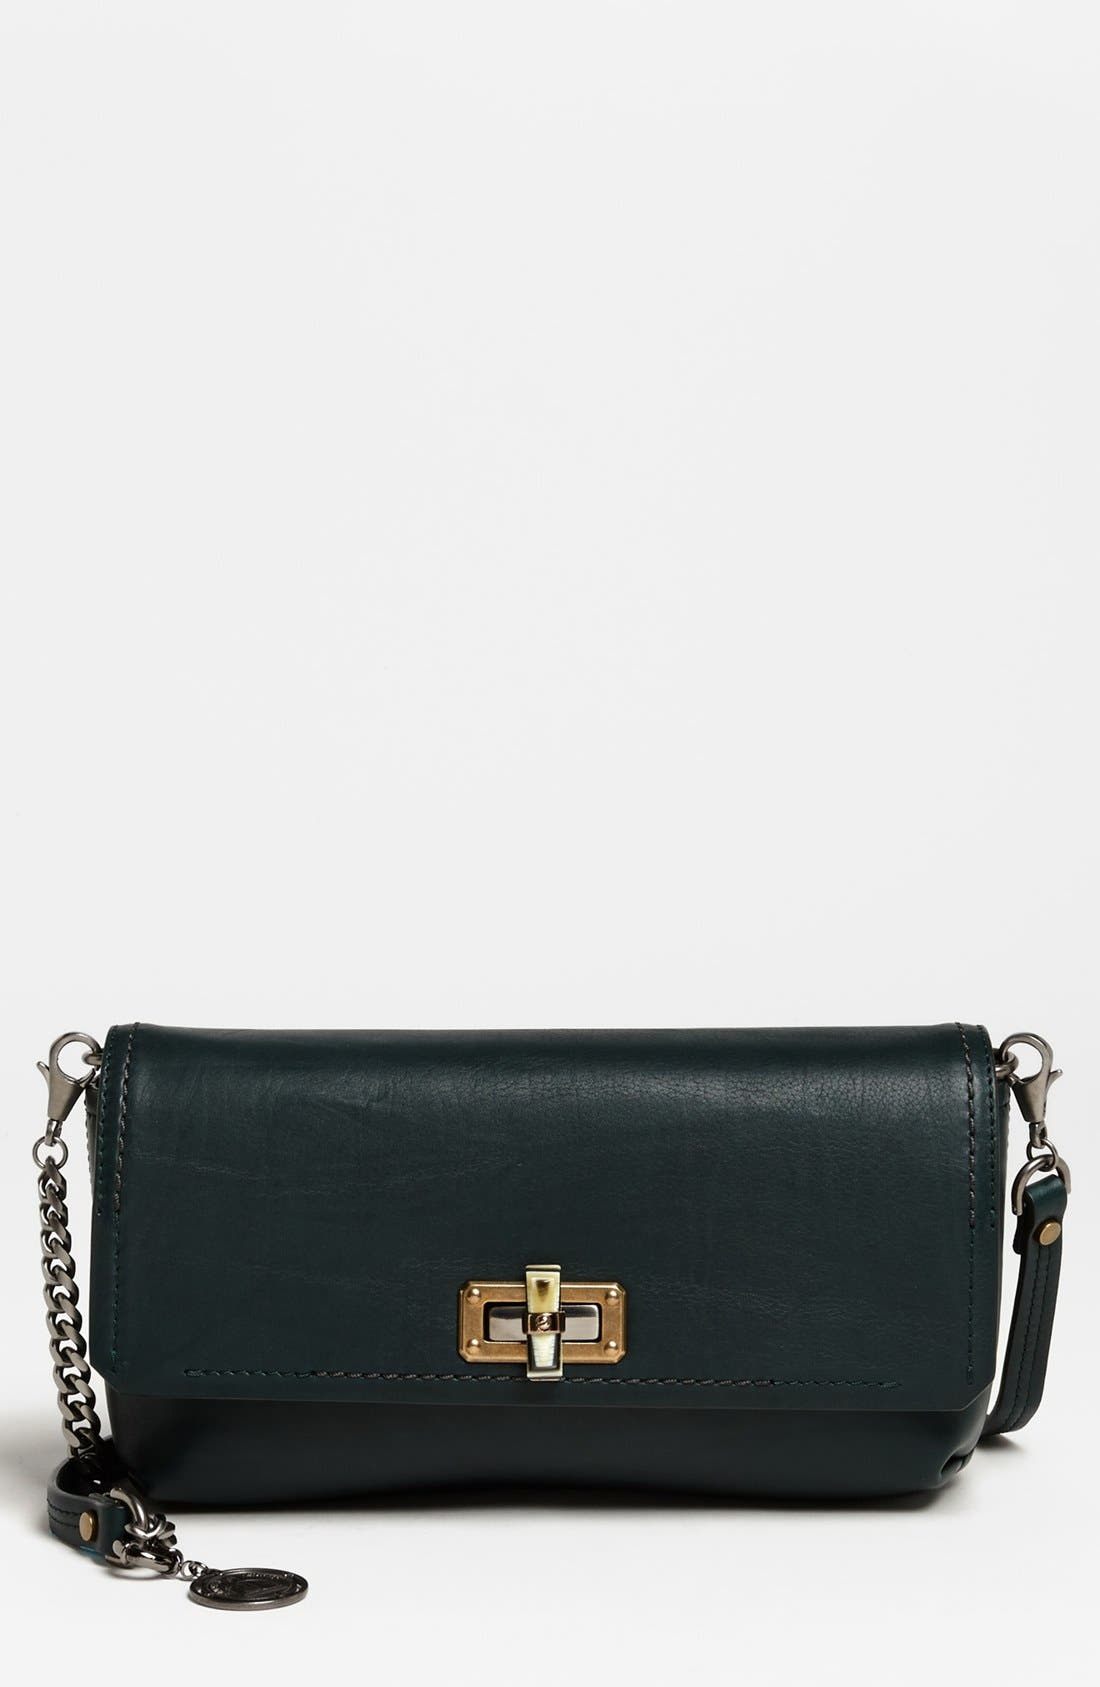 Alternate Image 1 Selected - Lanvin 'Happy' Leather Crossbody Bag